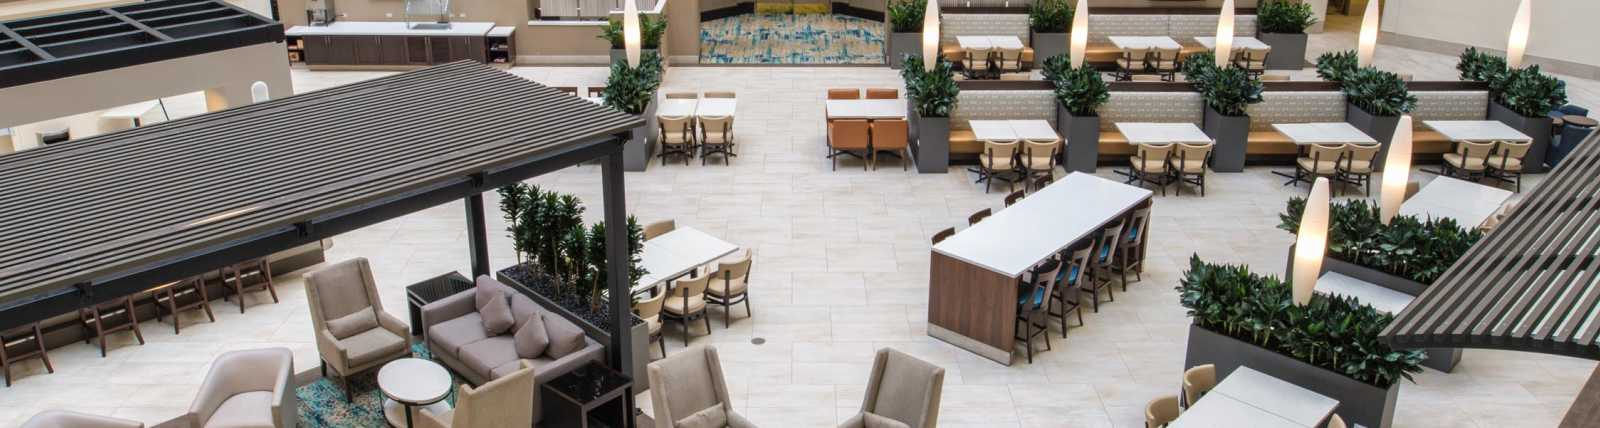 Newly renovated Atrium